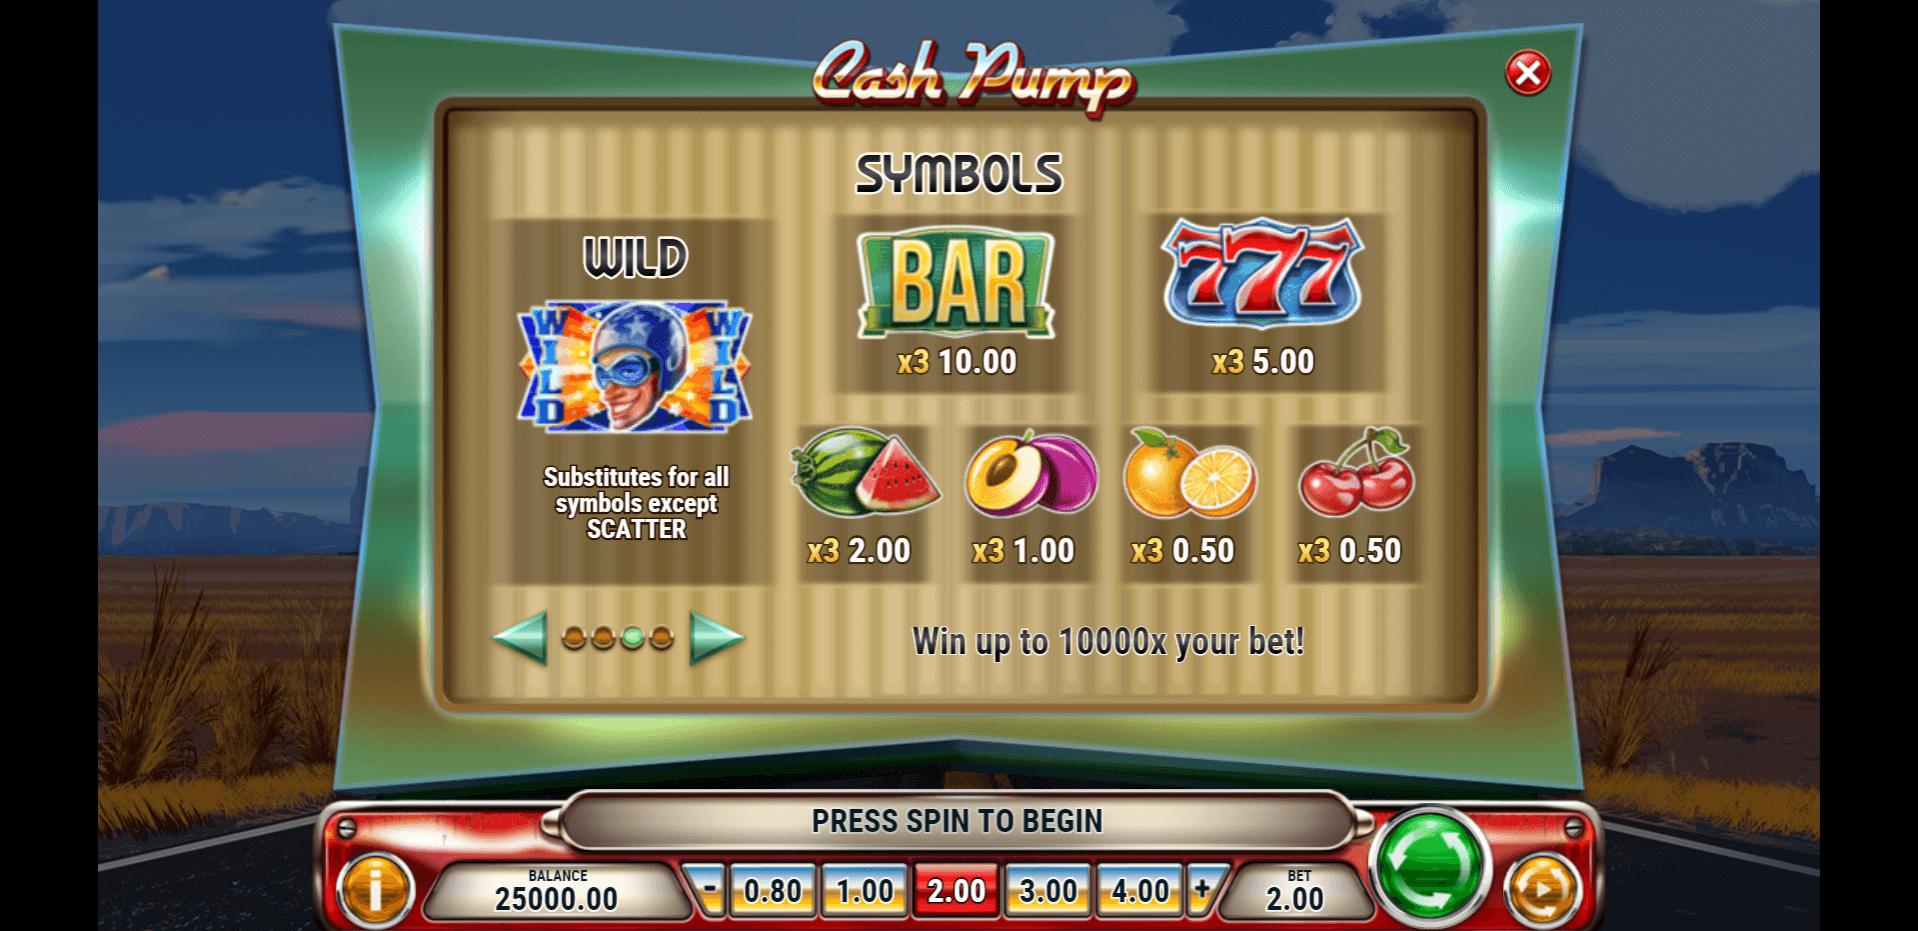 Cash Pump Slot Machine